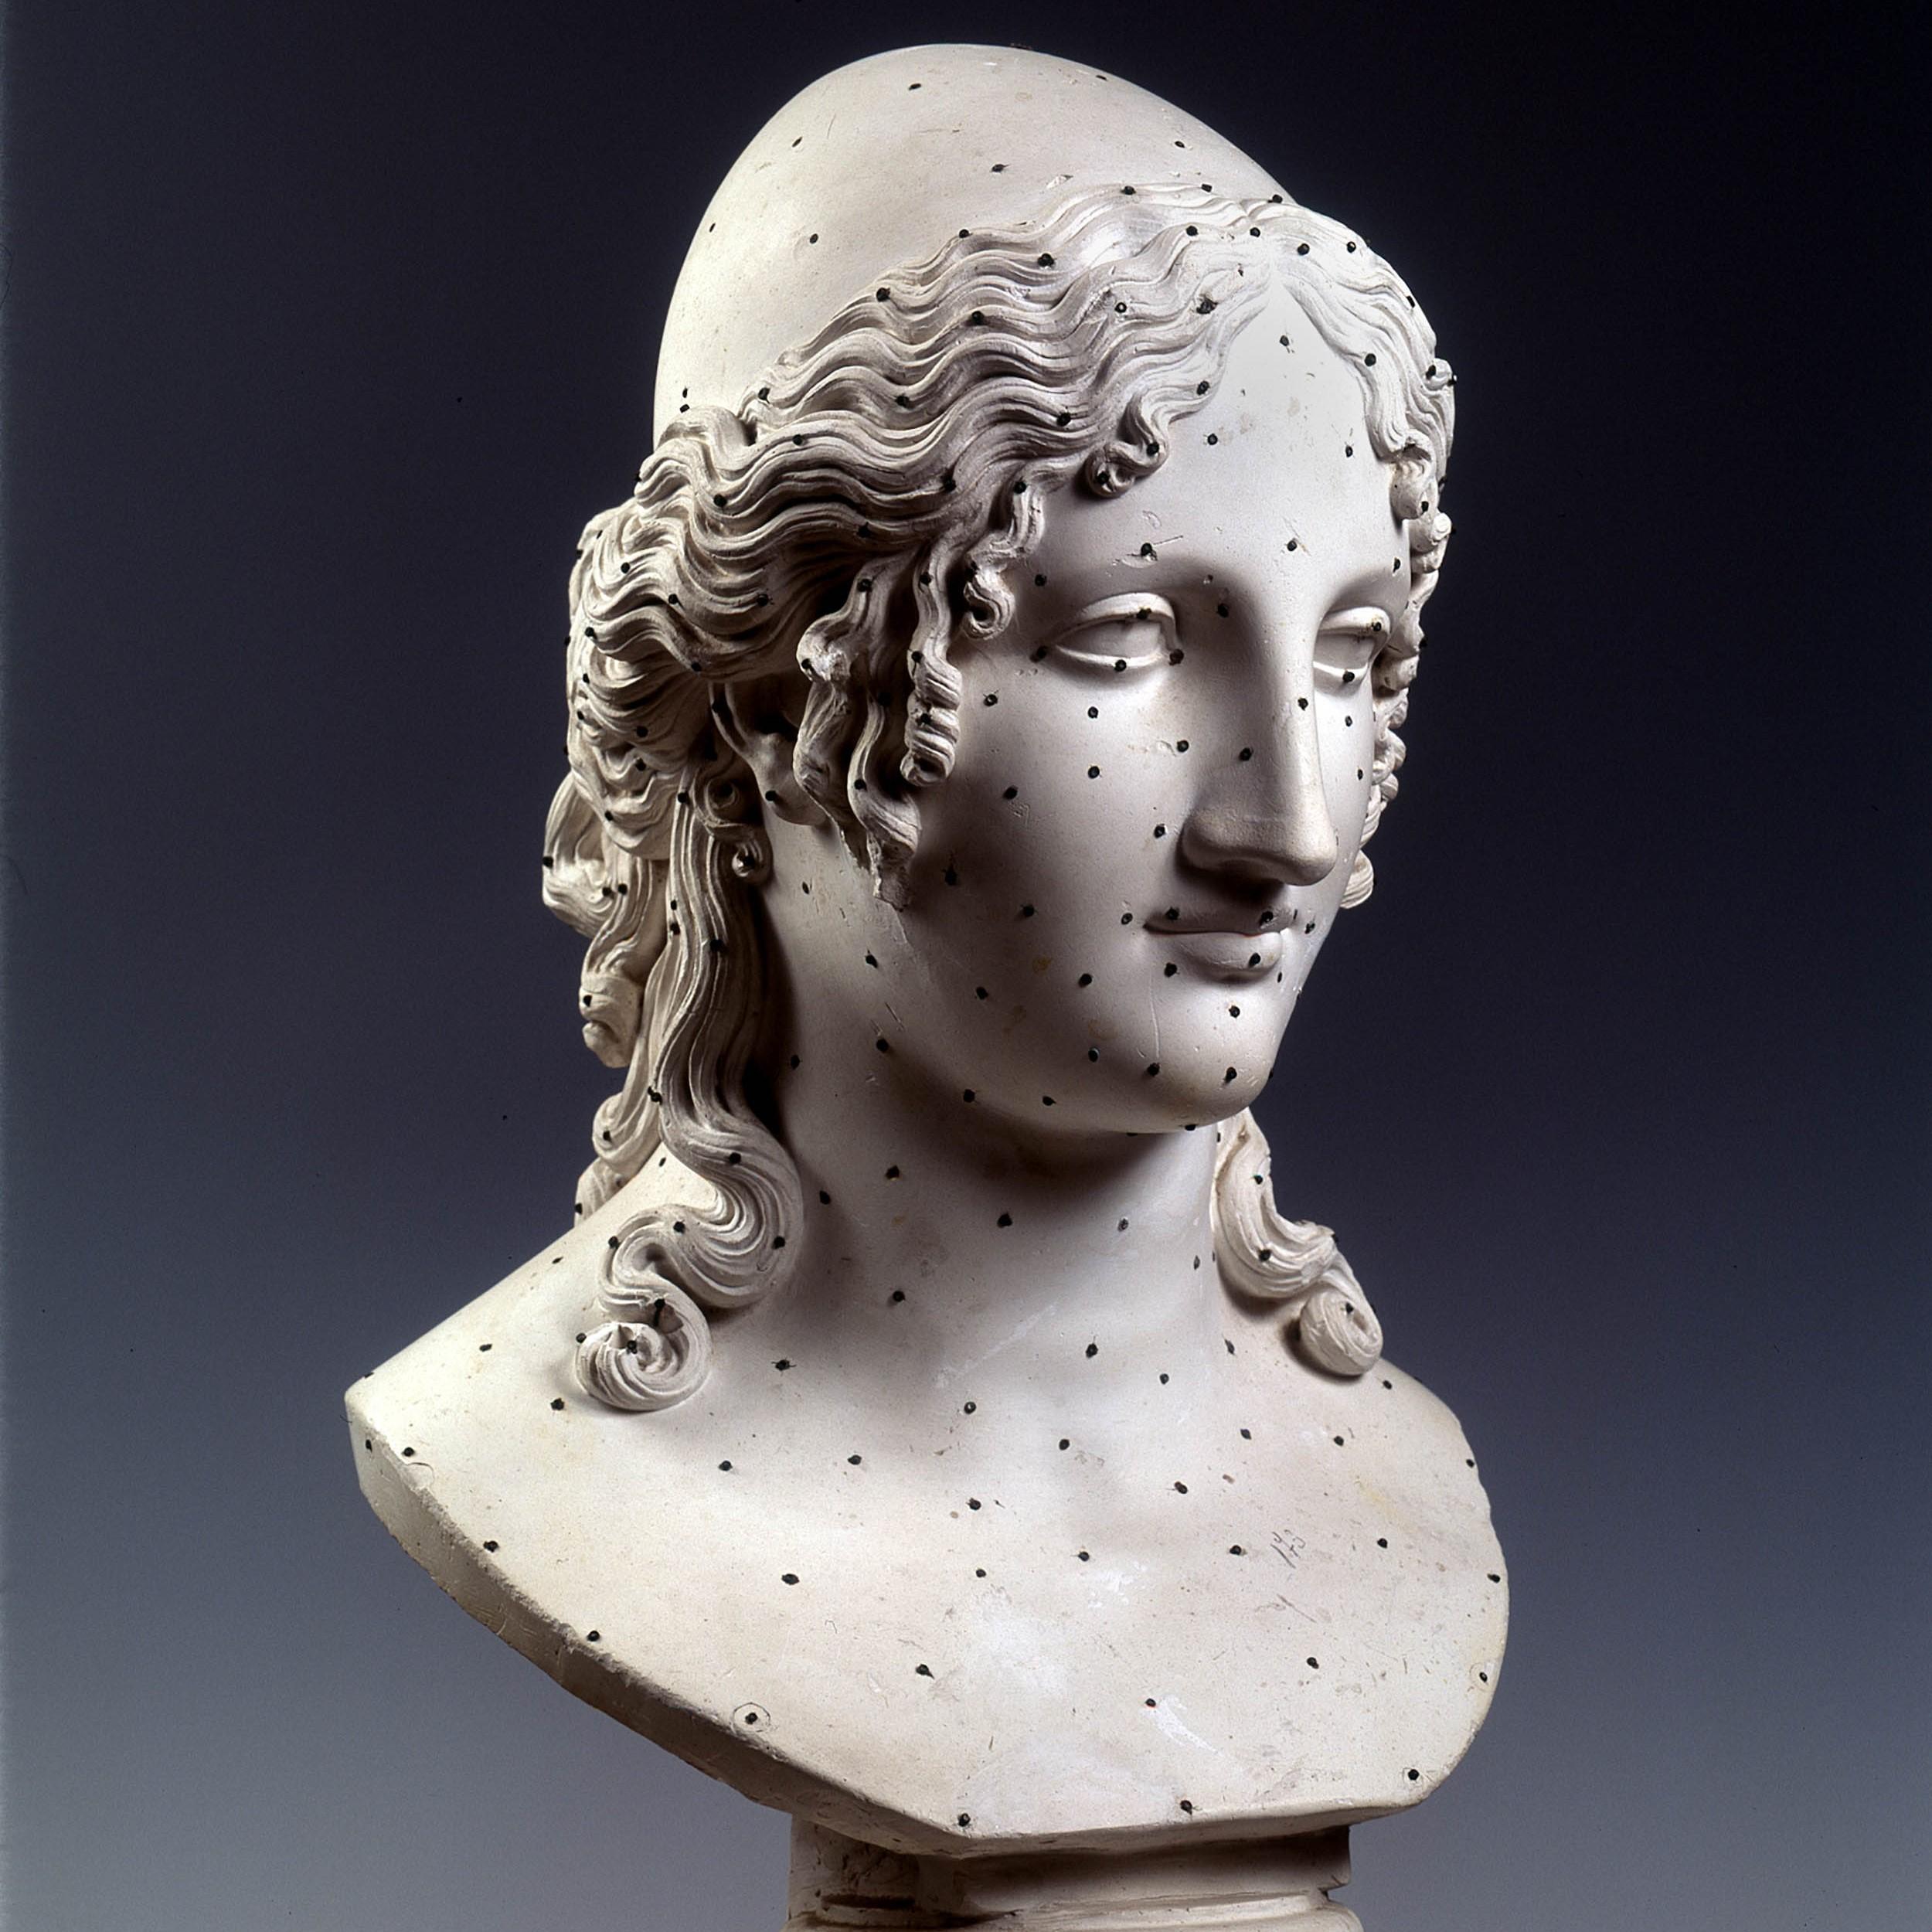 Antonio Canova. Elena., 1812, Possagno, Gipsoteca.